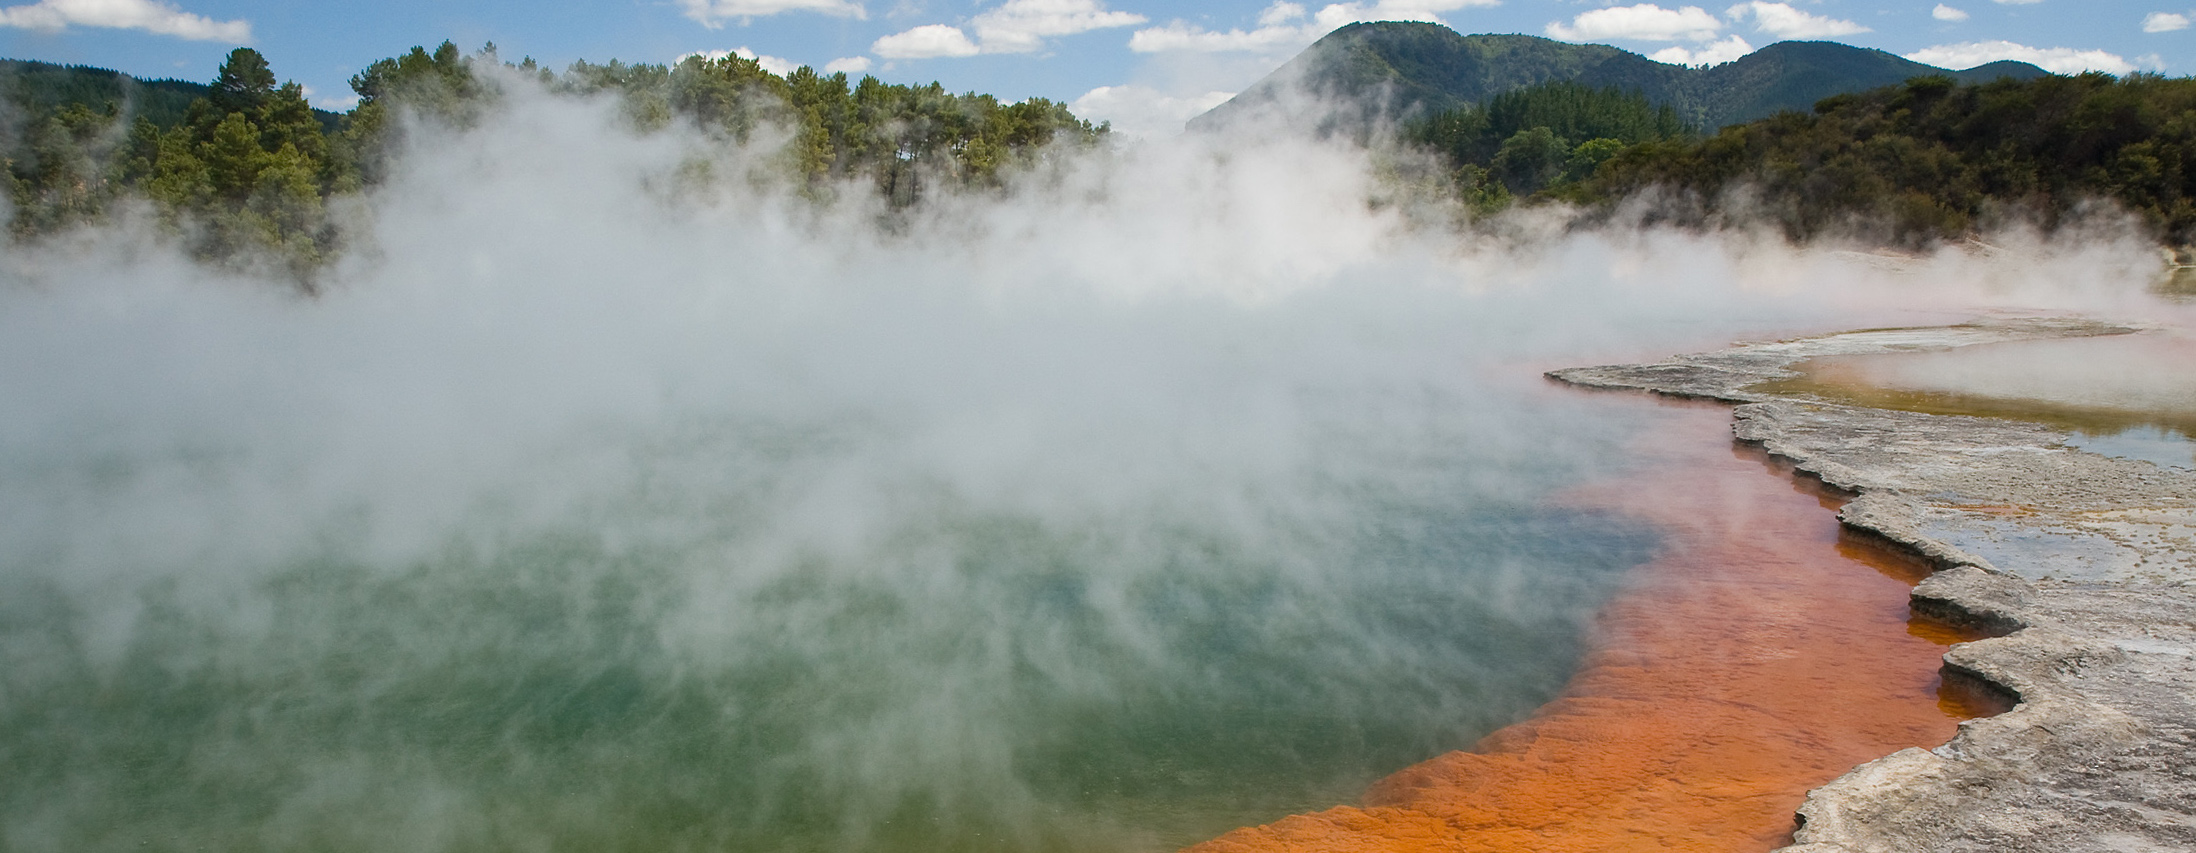 geothermal ChampagnePool-Wai-O-Tapu_rotated_MC Christian Mehlführer wikimedia ccc2.5 crop